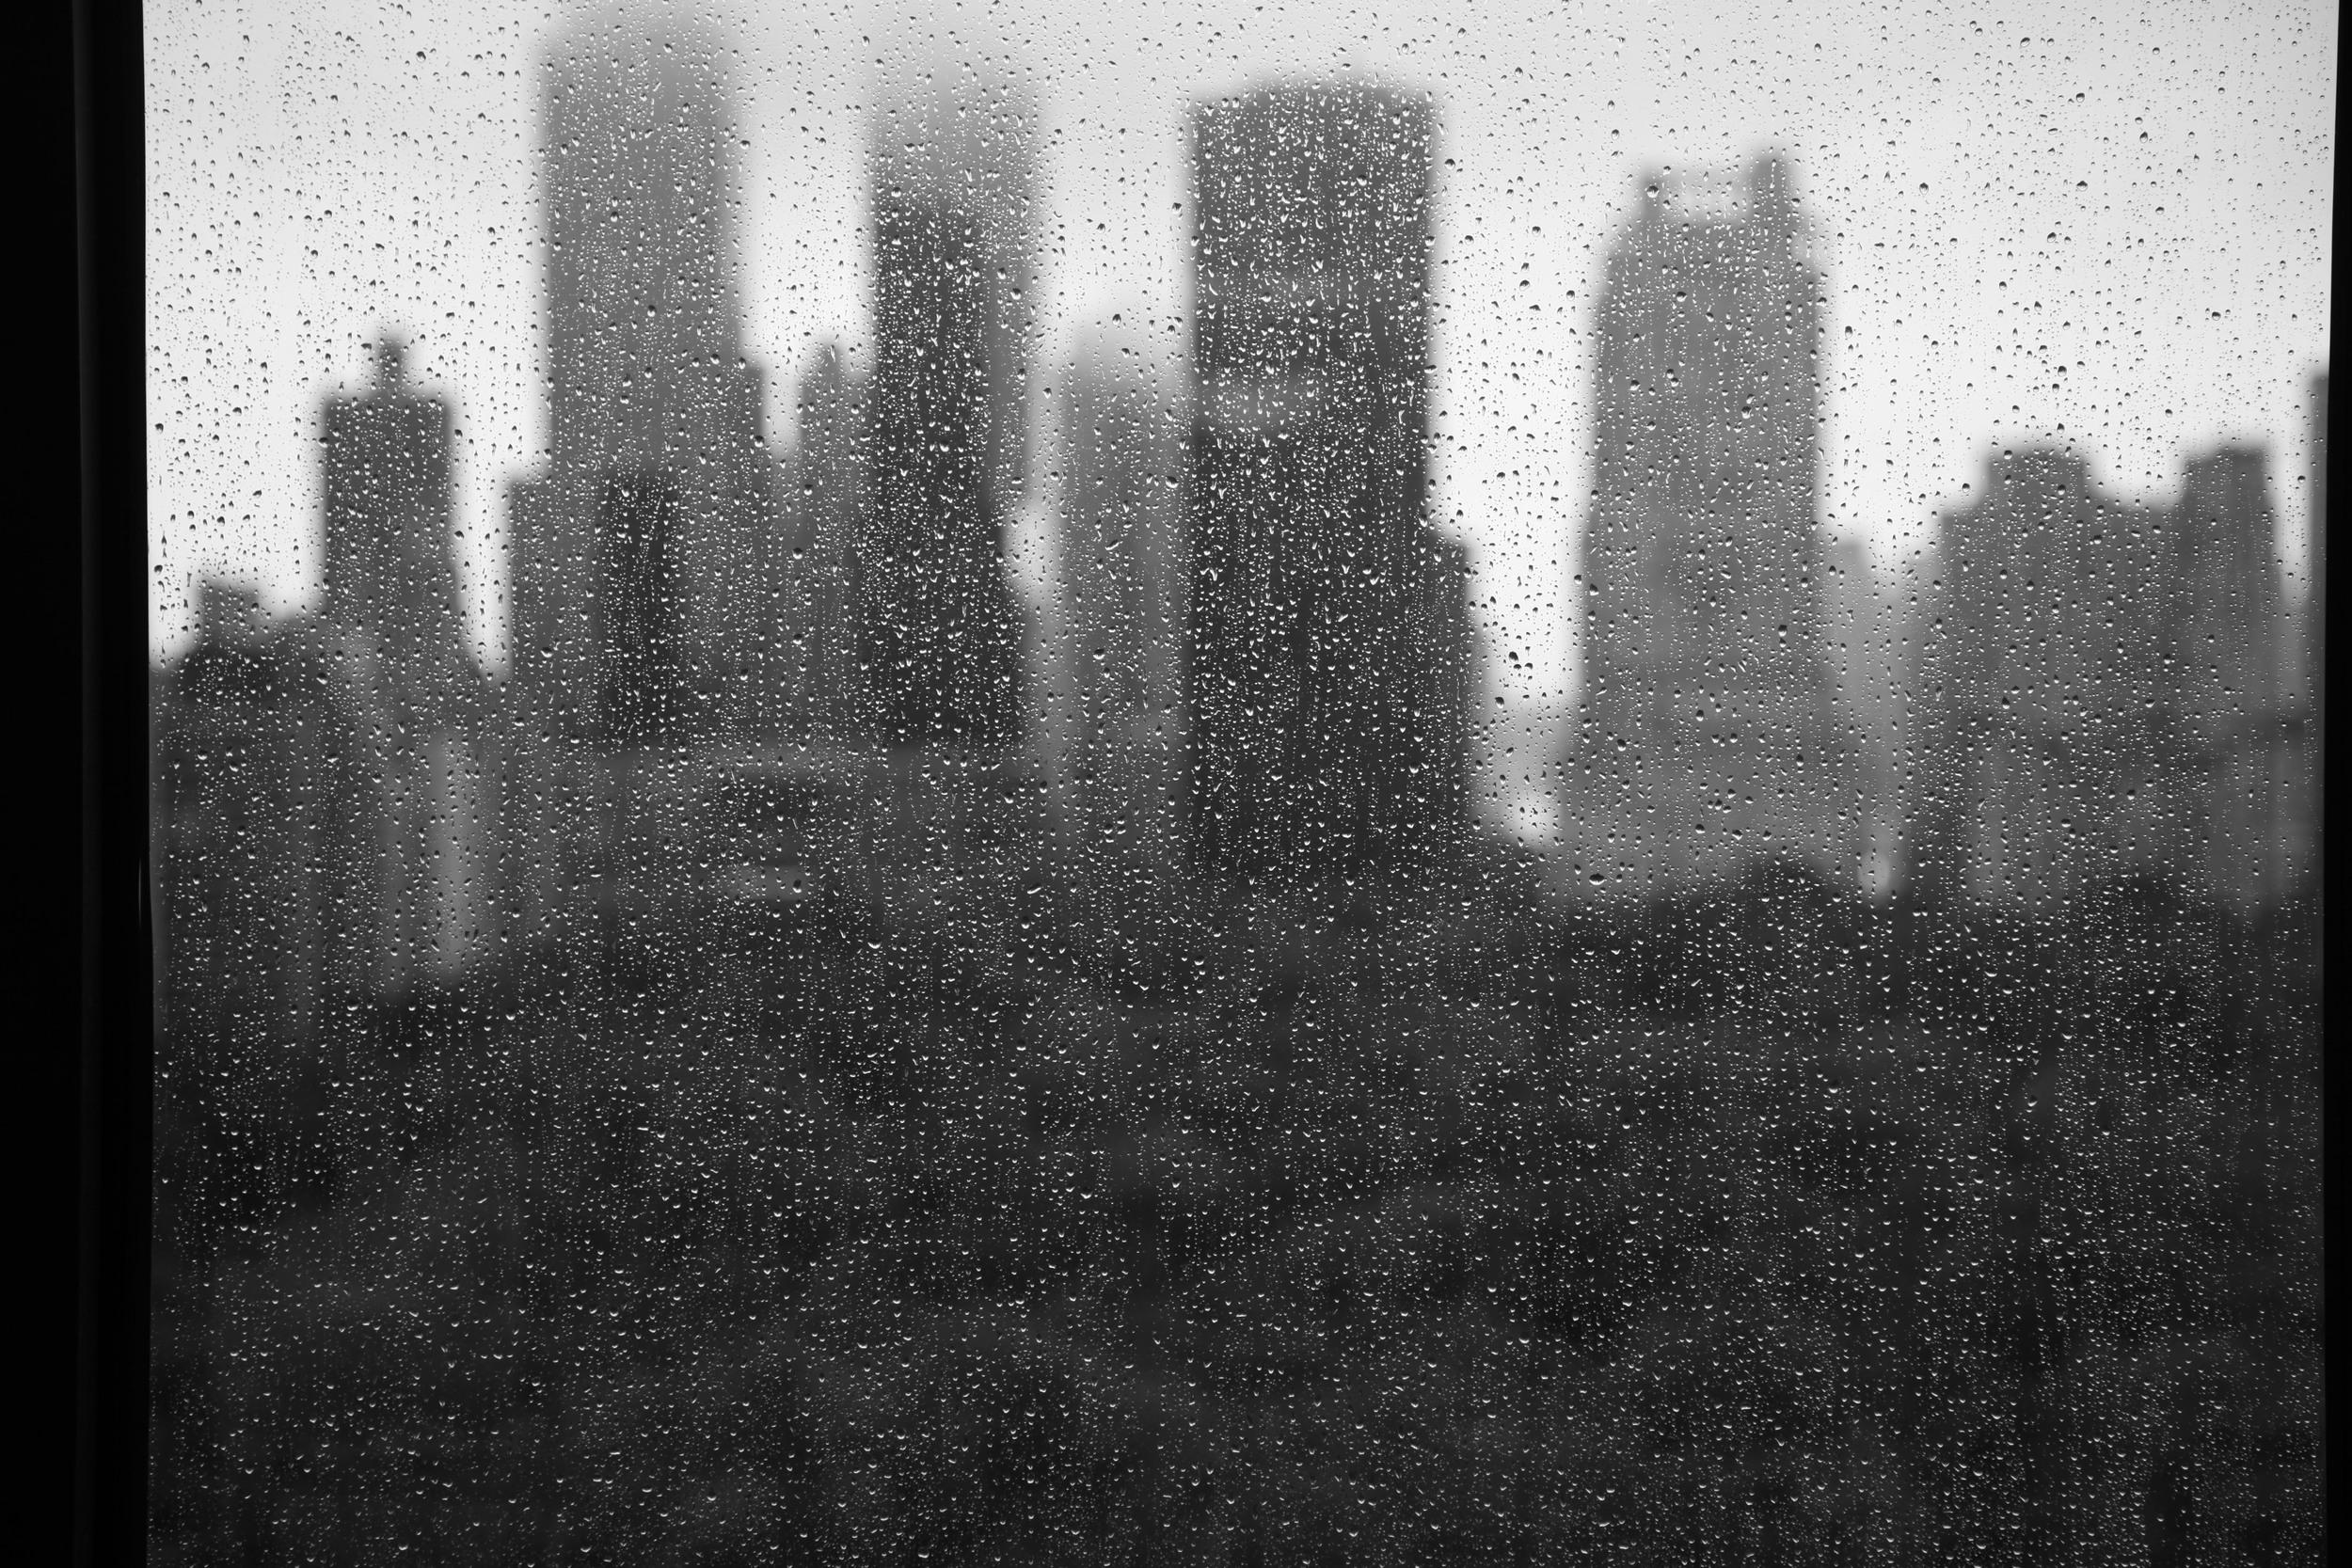 Bryan Fox photography - landscape